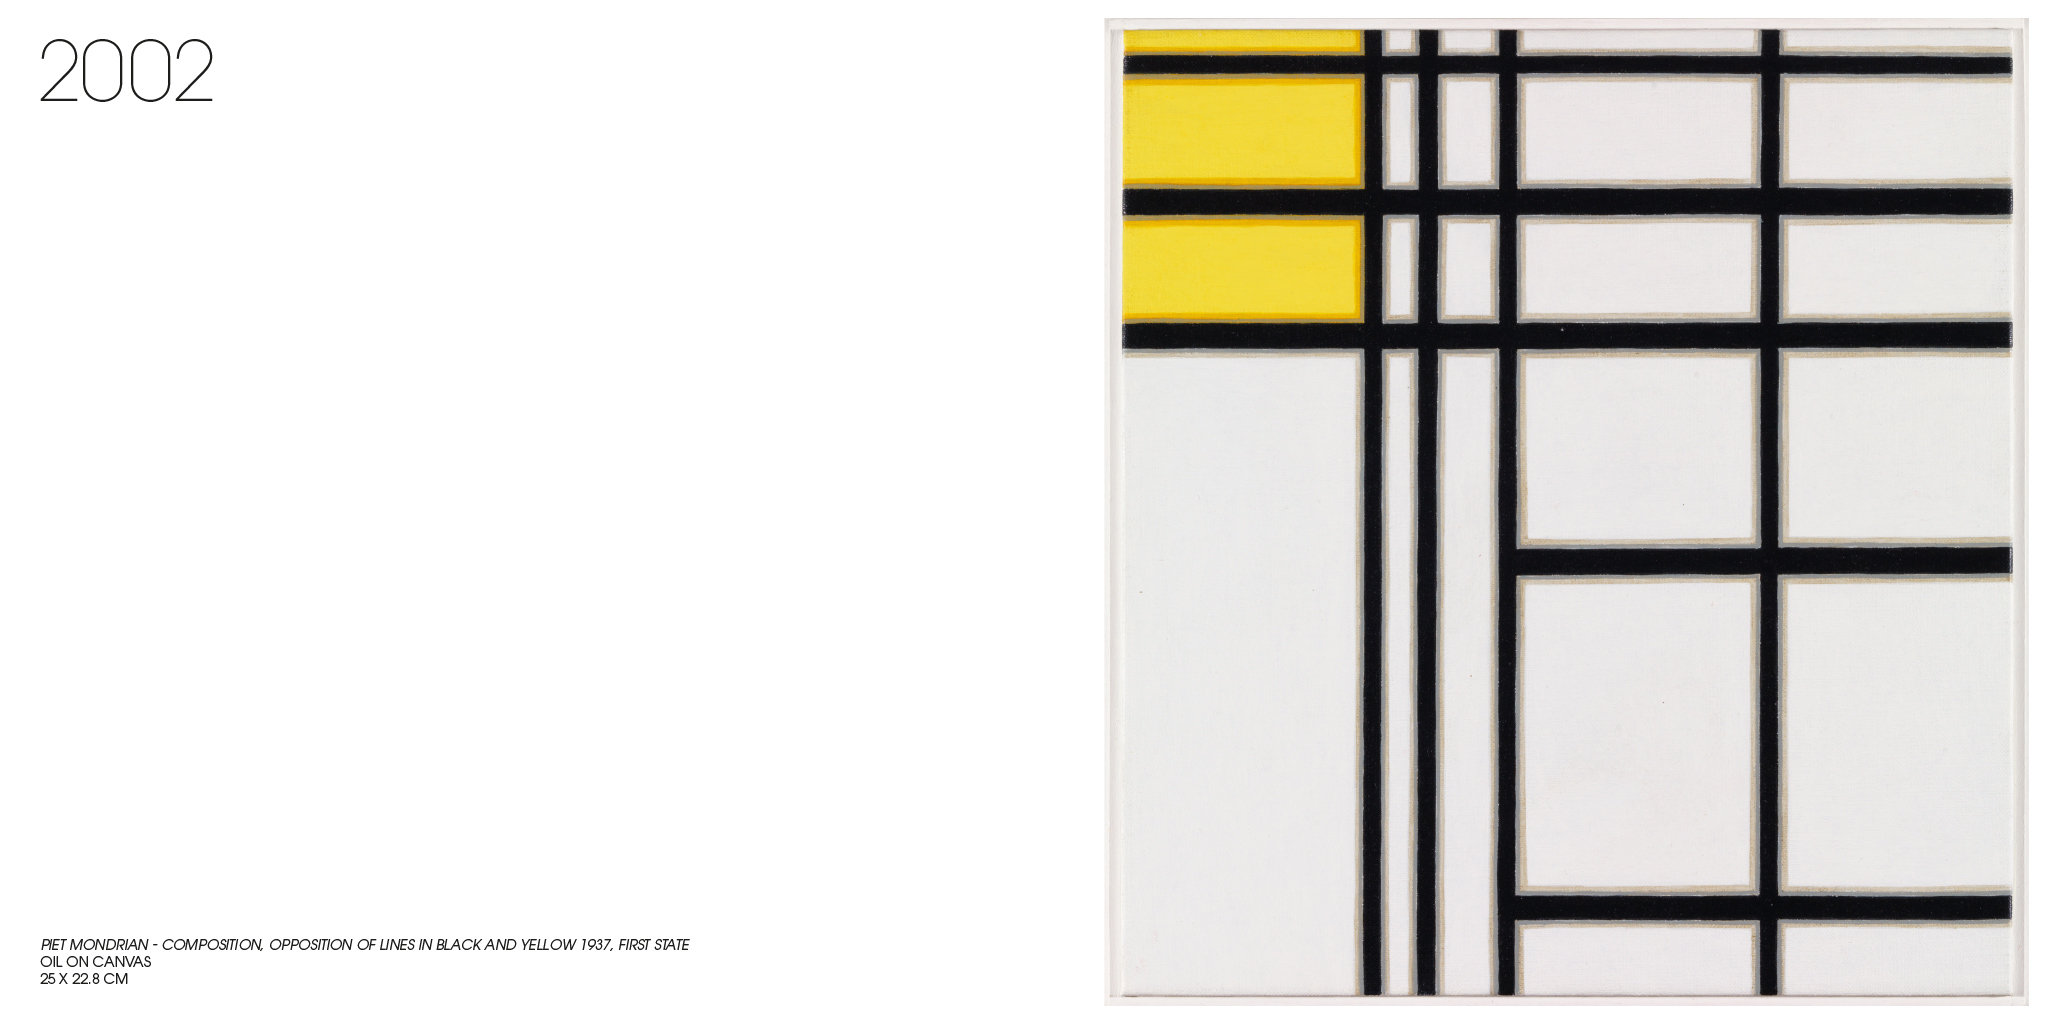 GALERIE MITTERRAND Catalogue Richard Pettibone. Exposition Art contemporain Tableaux